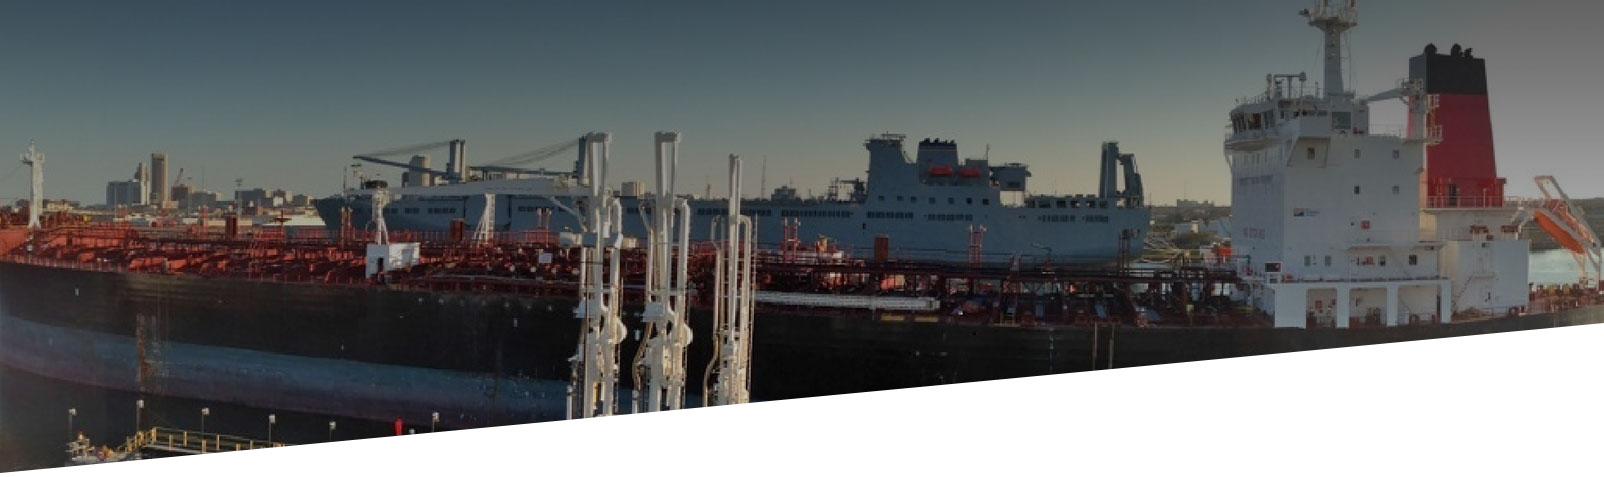 cargo ship at marine port